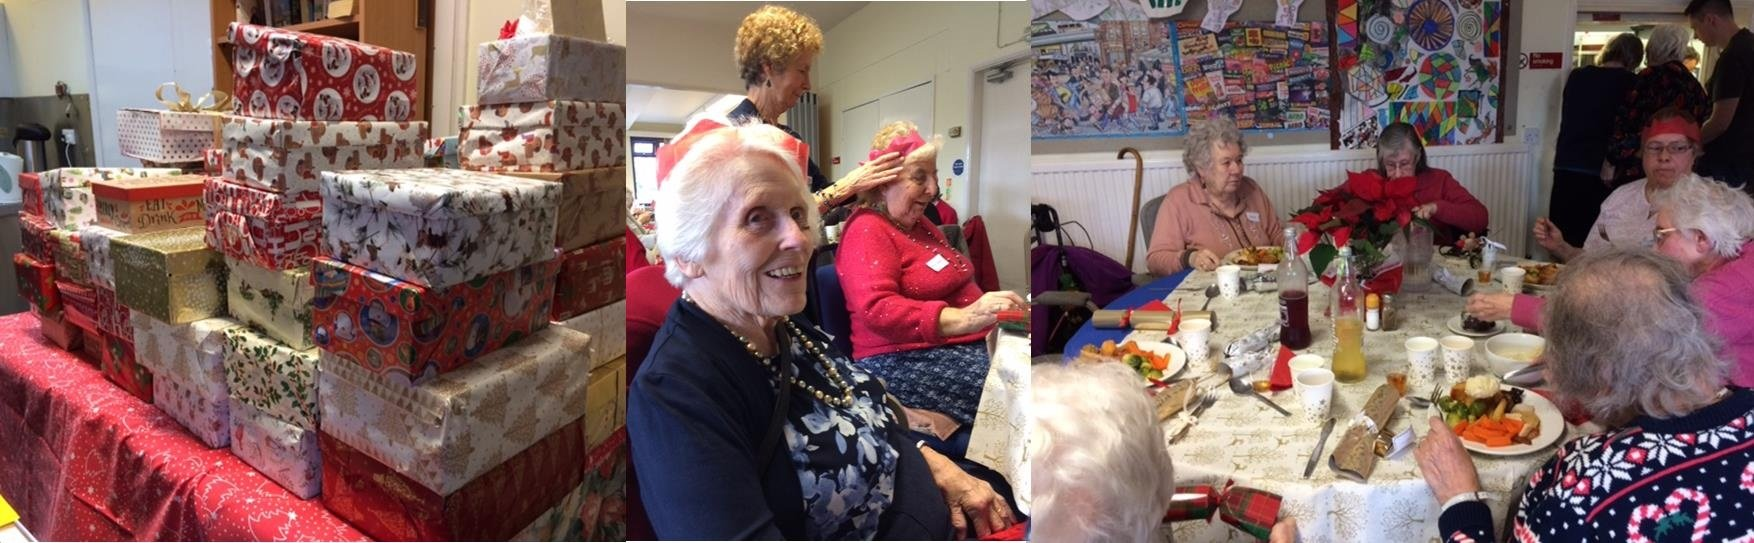 Farnham residents enjoying a Christmas lunch at the Gostrey center